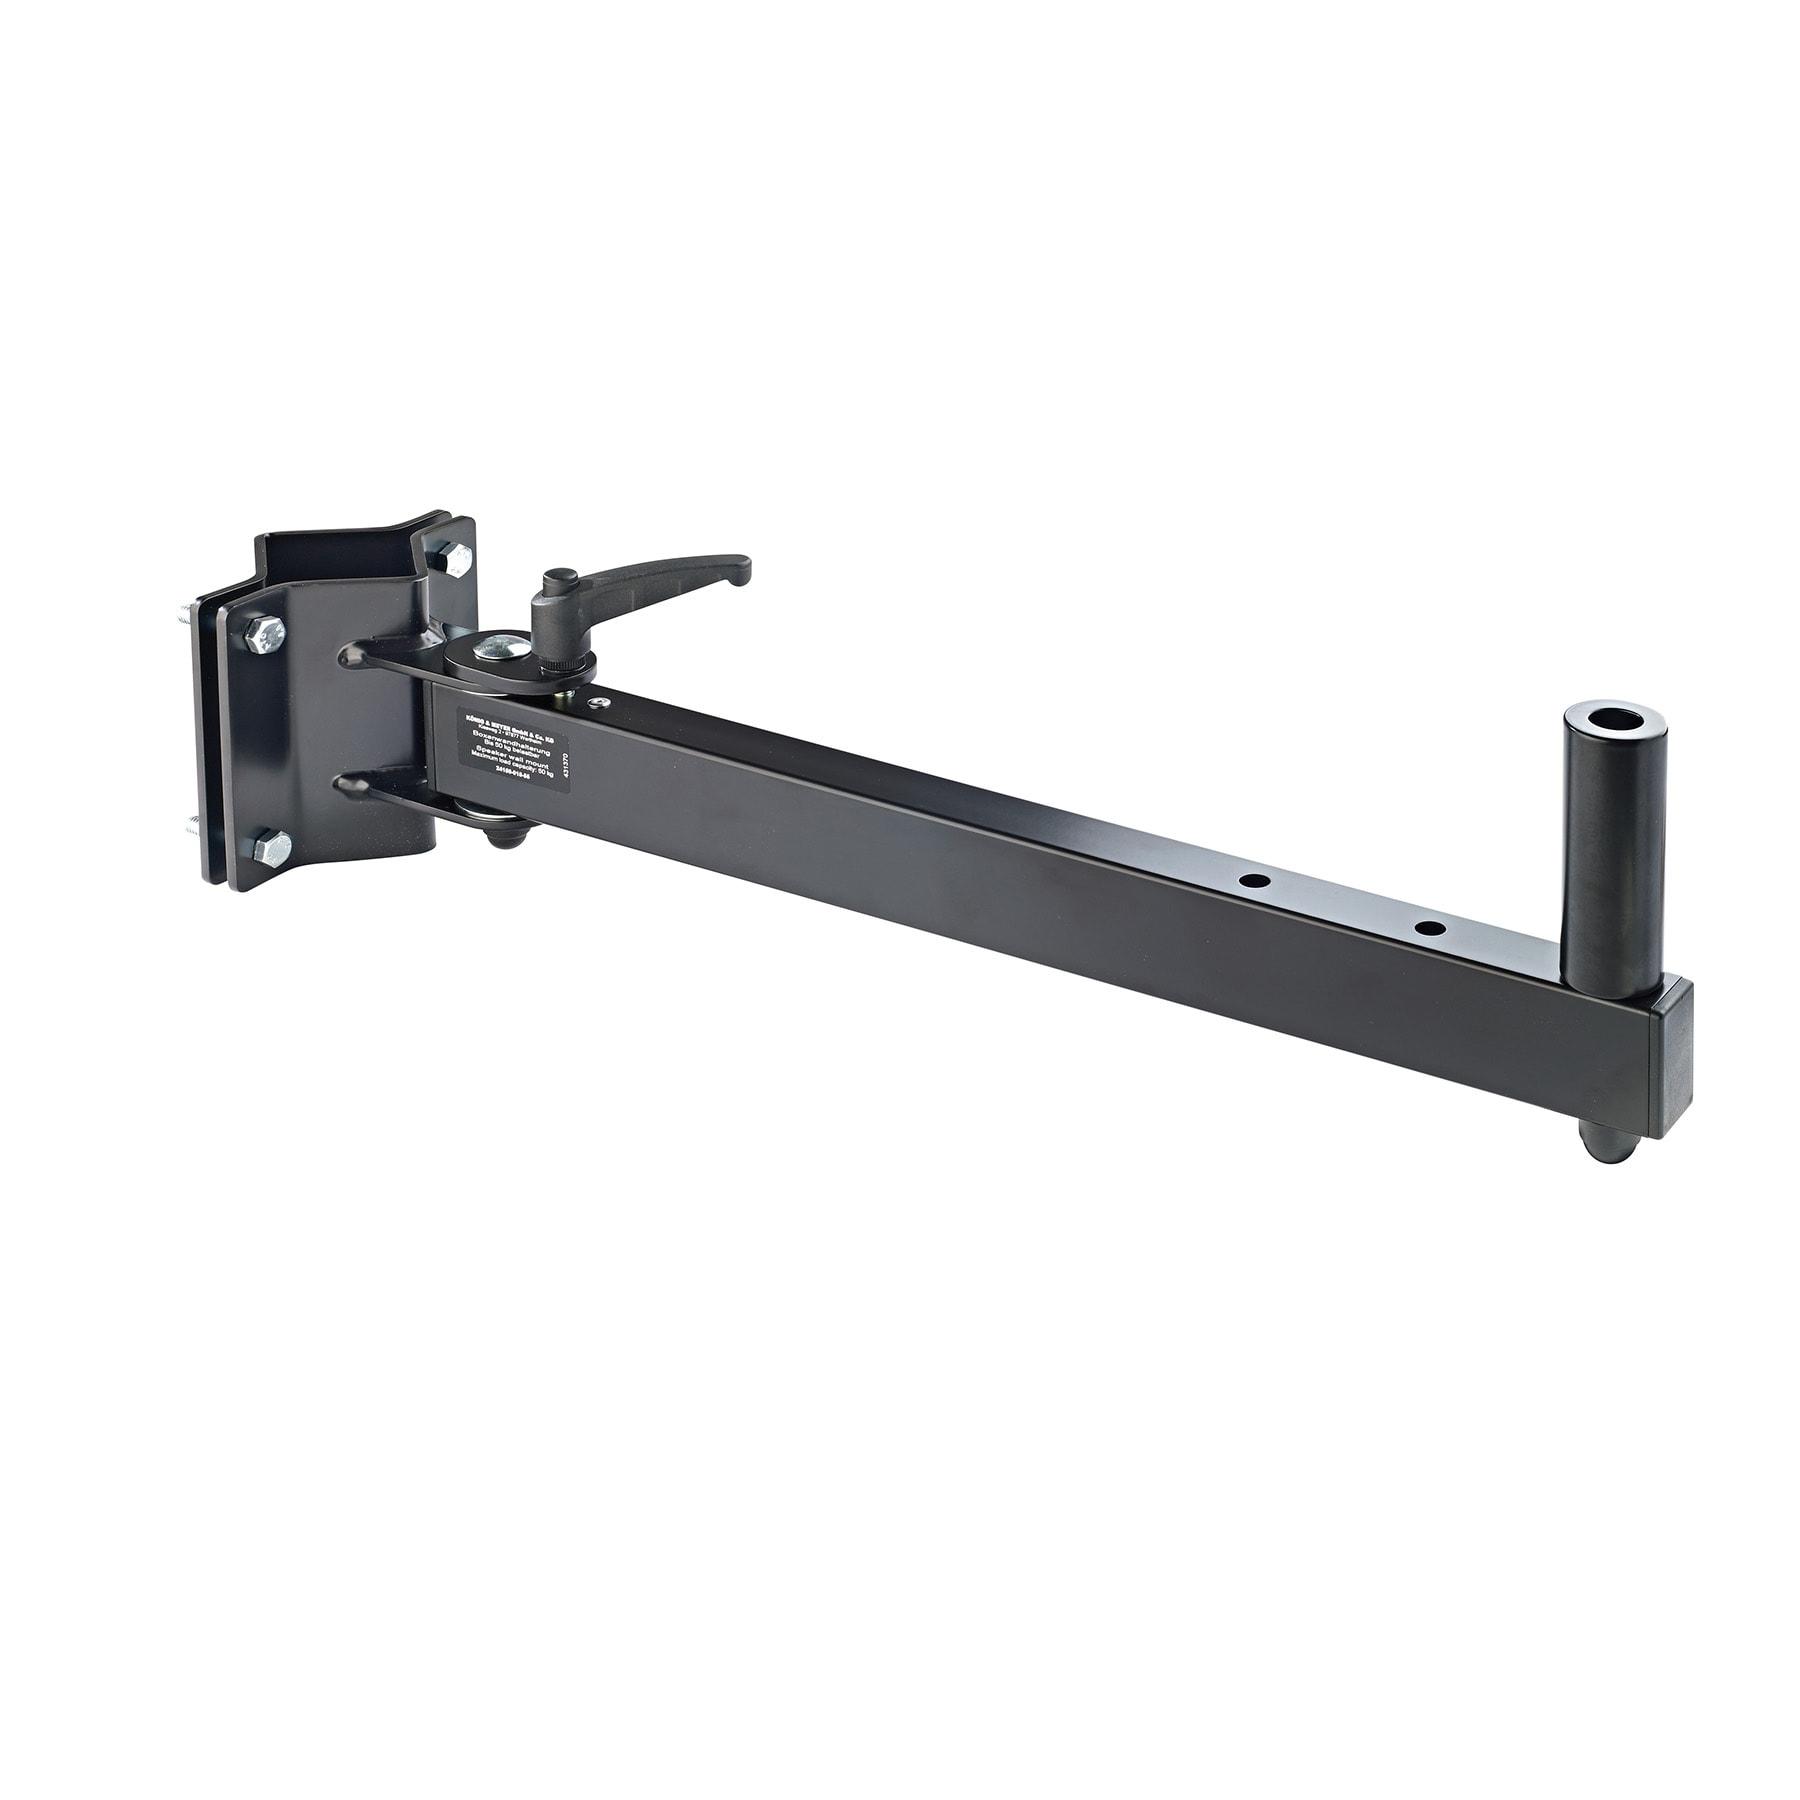 KM24150 - Speaker mount